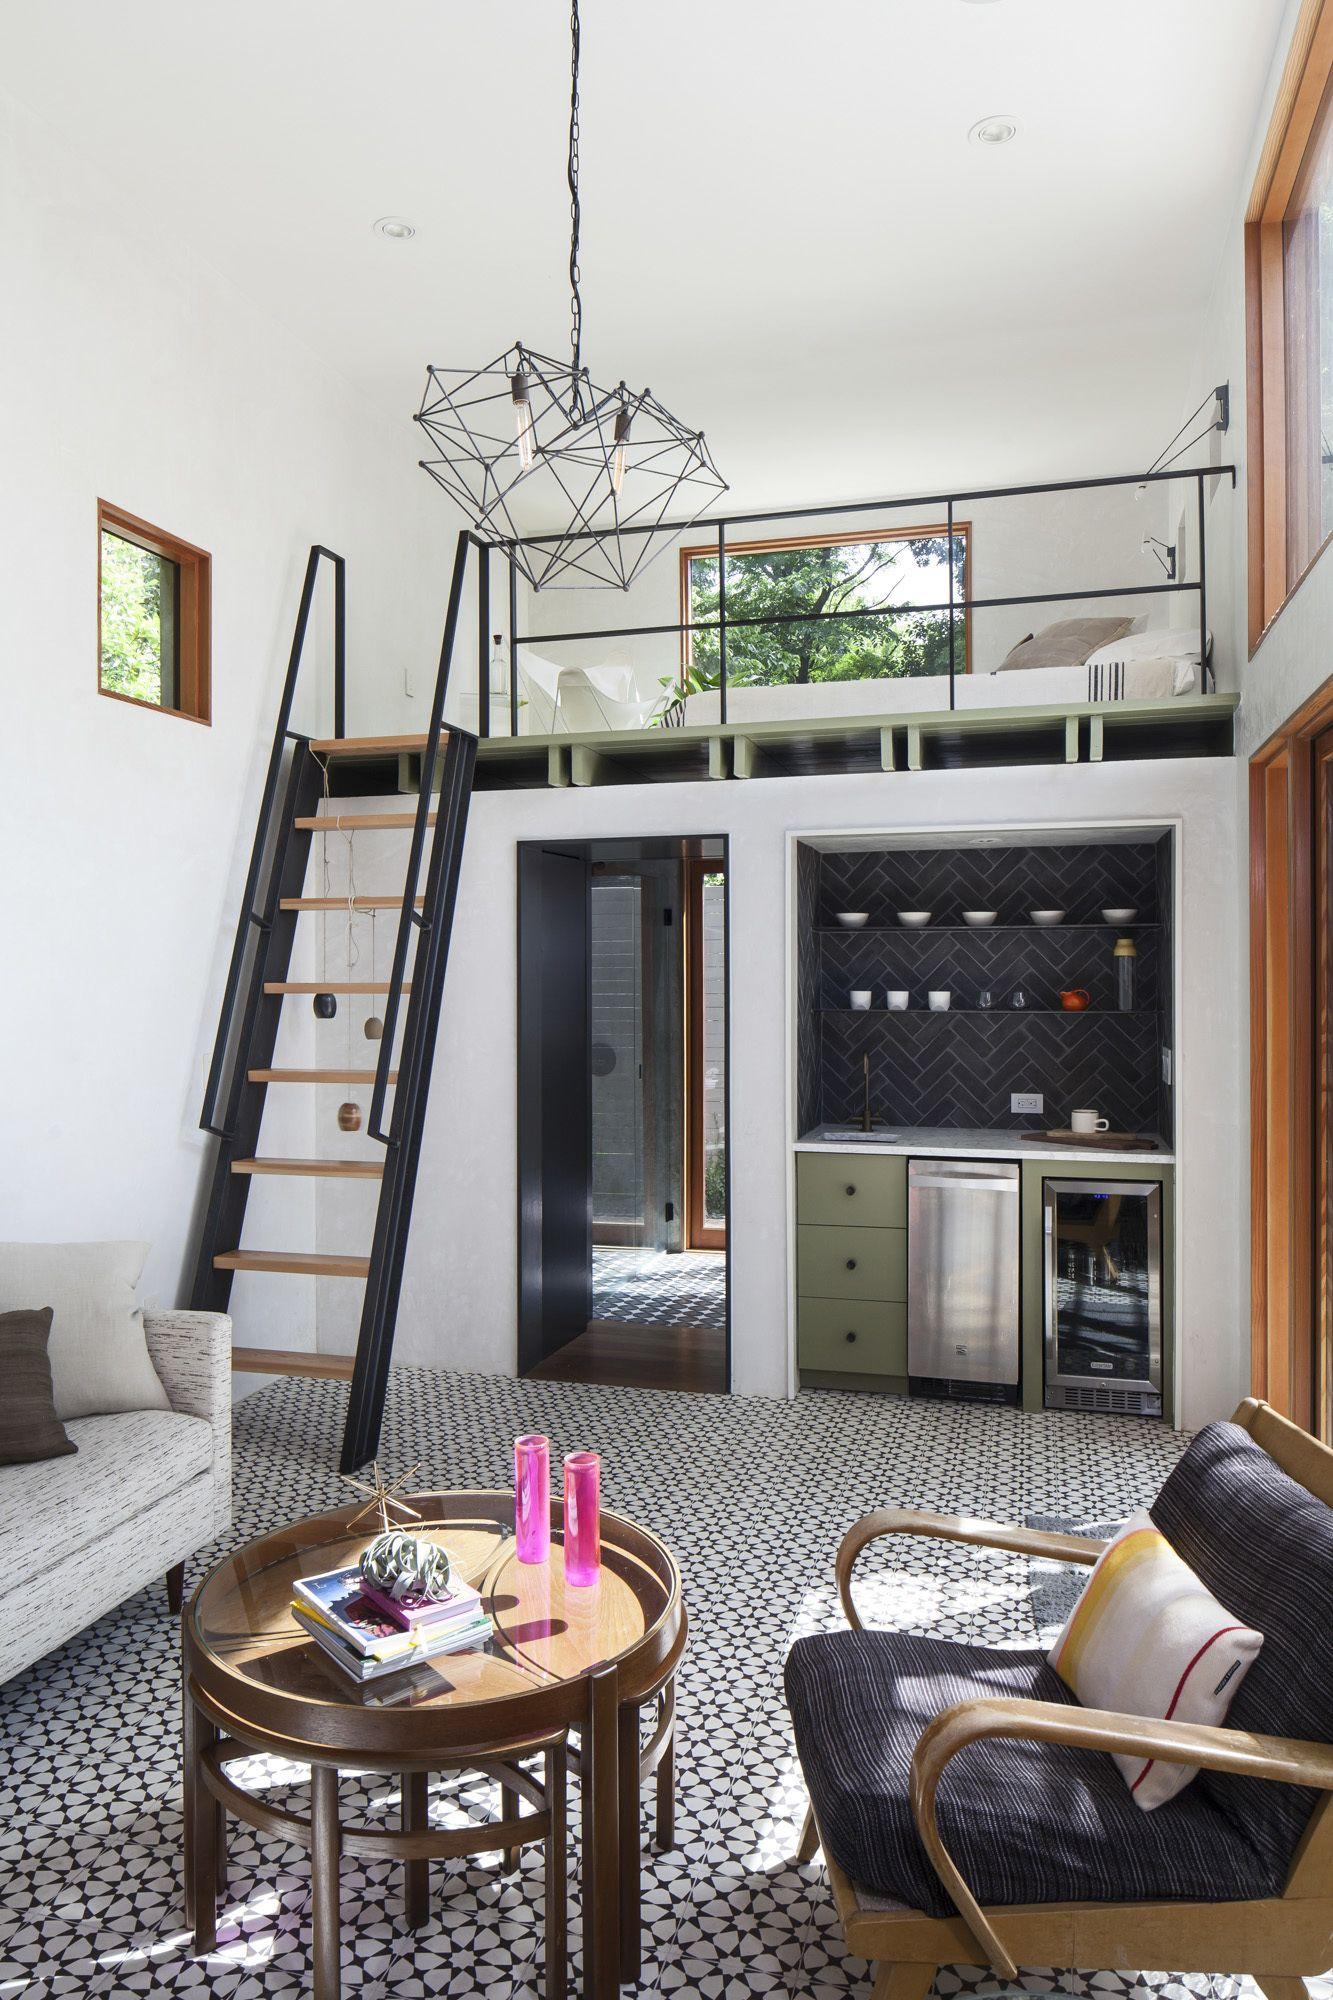 Garner Pool & Casita in 2020 | Tiny house layout, Tiny